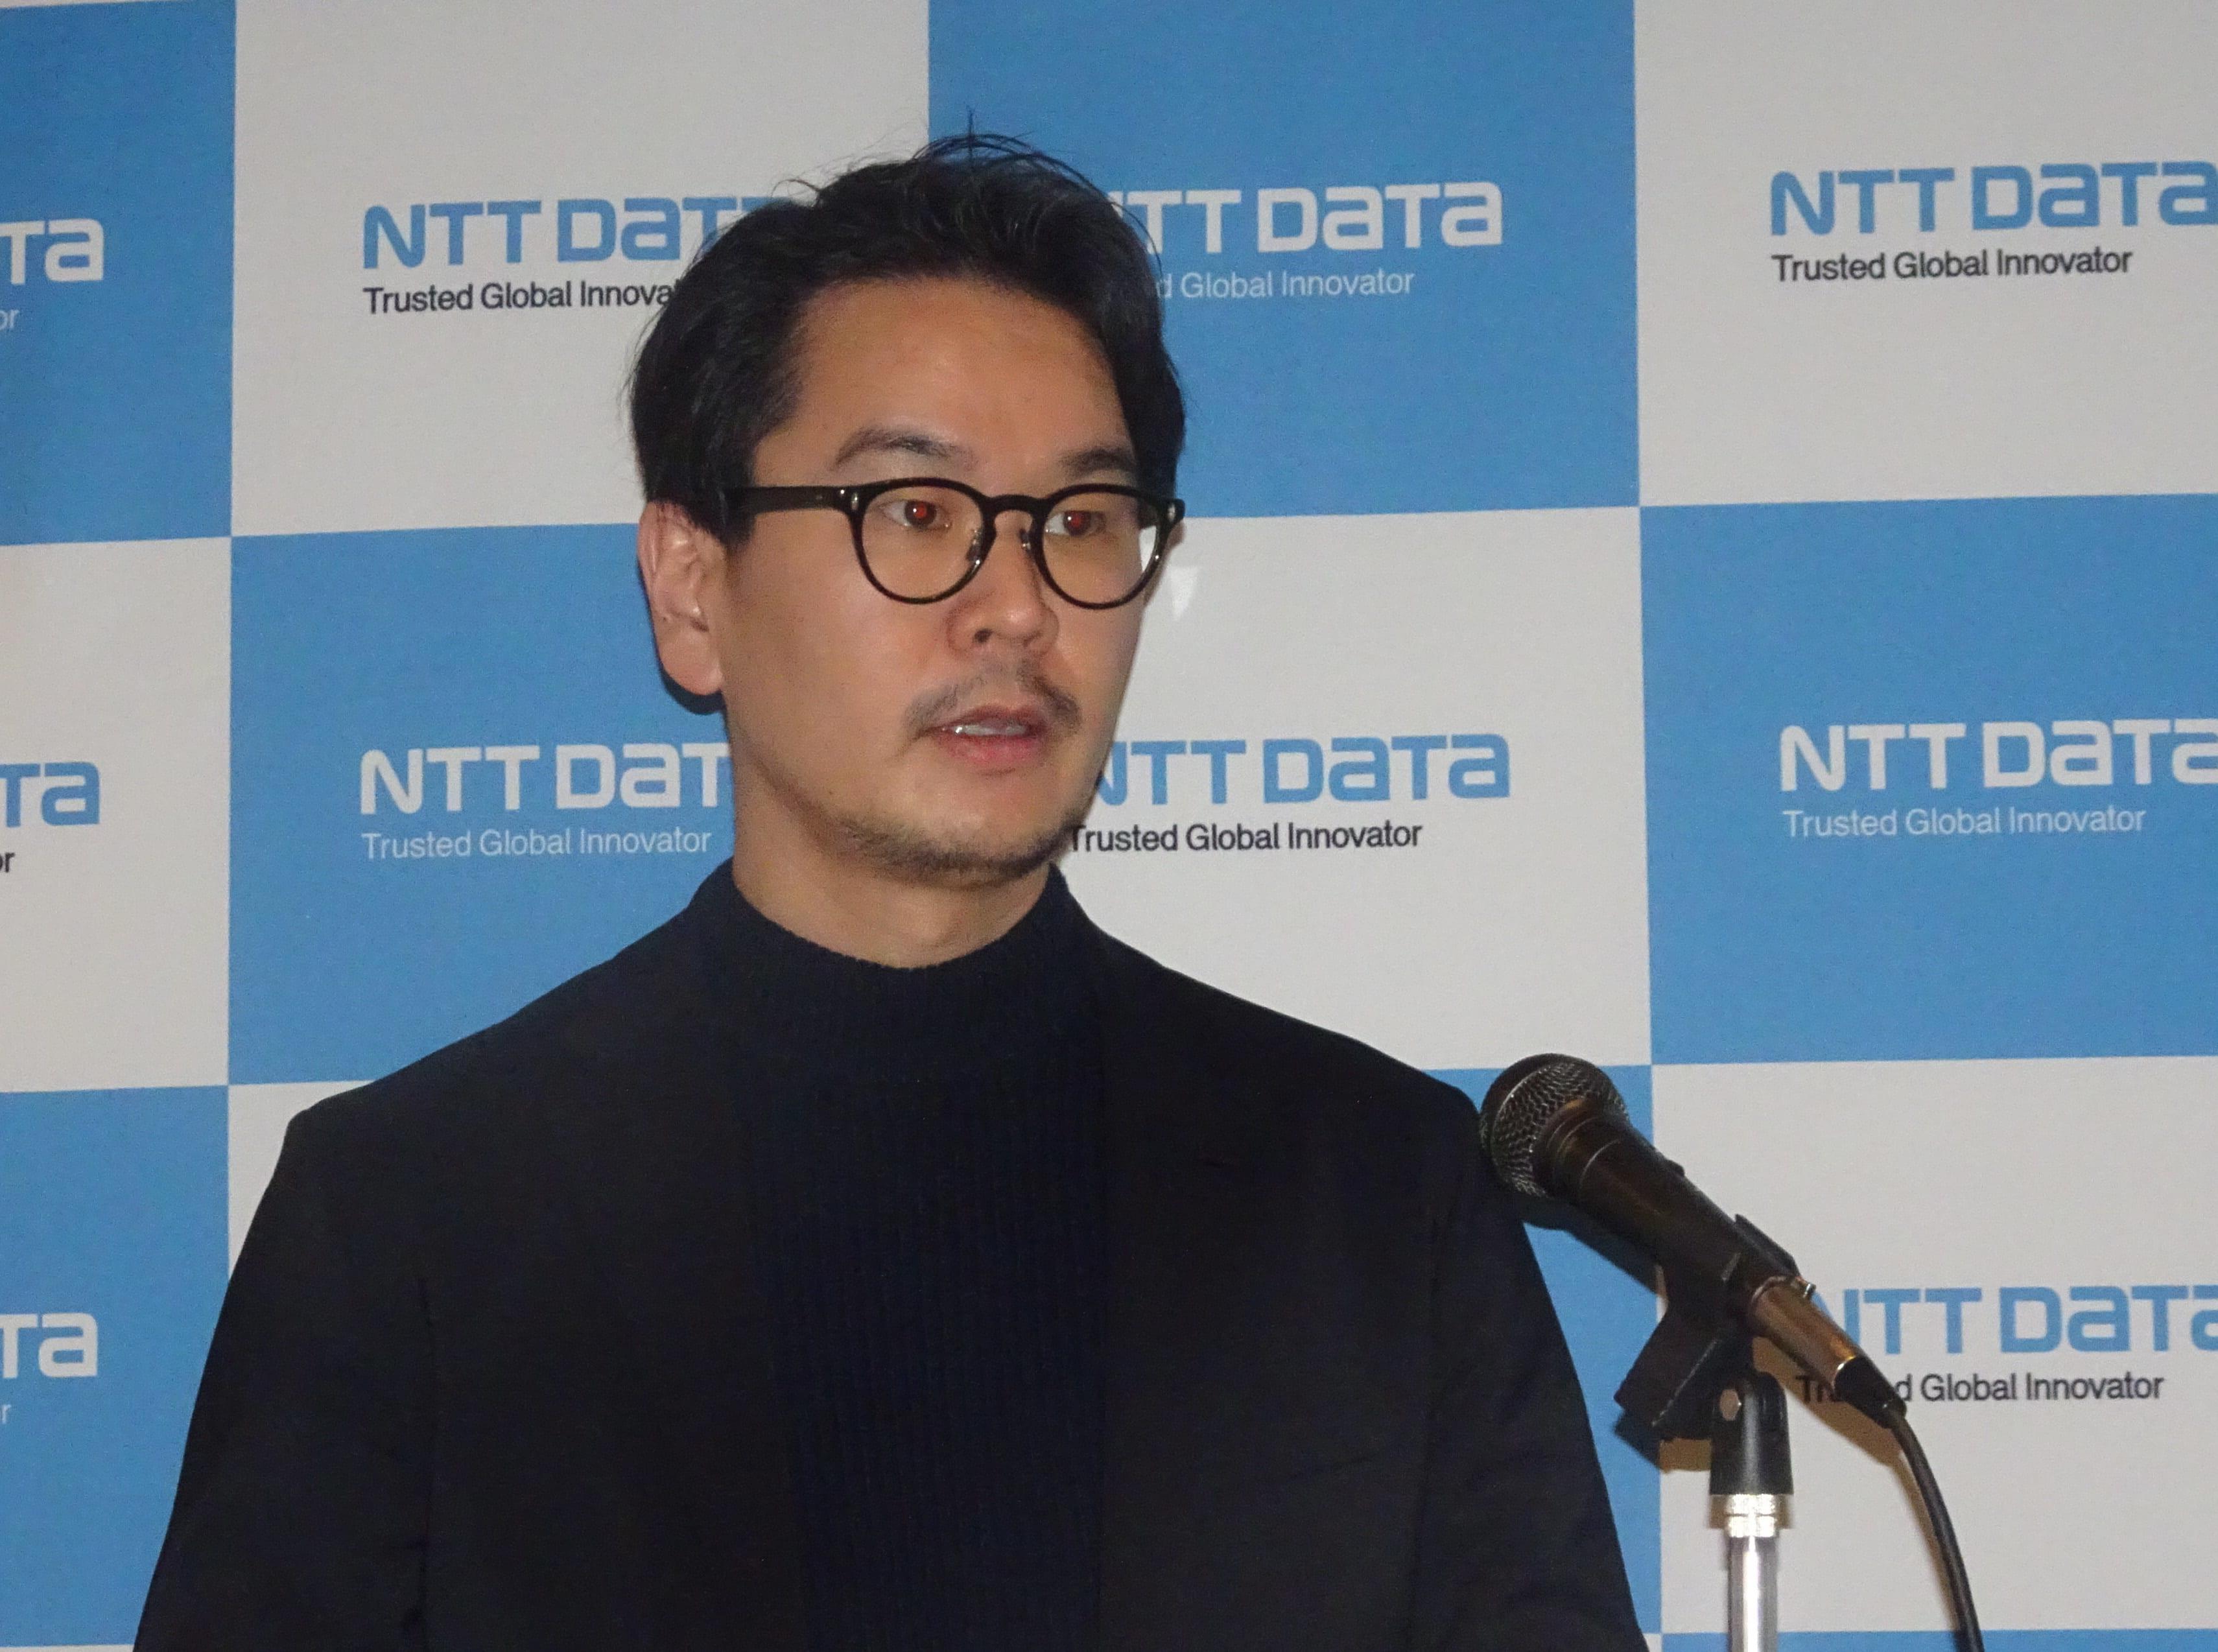 NTTデータの新井悠氏(Executive Security Analyst)